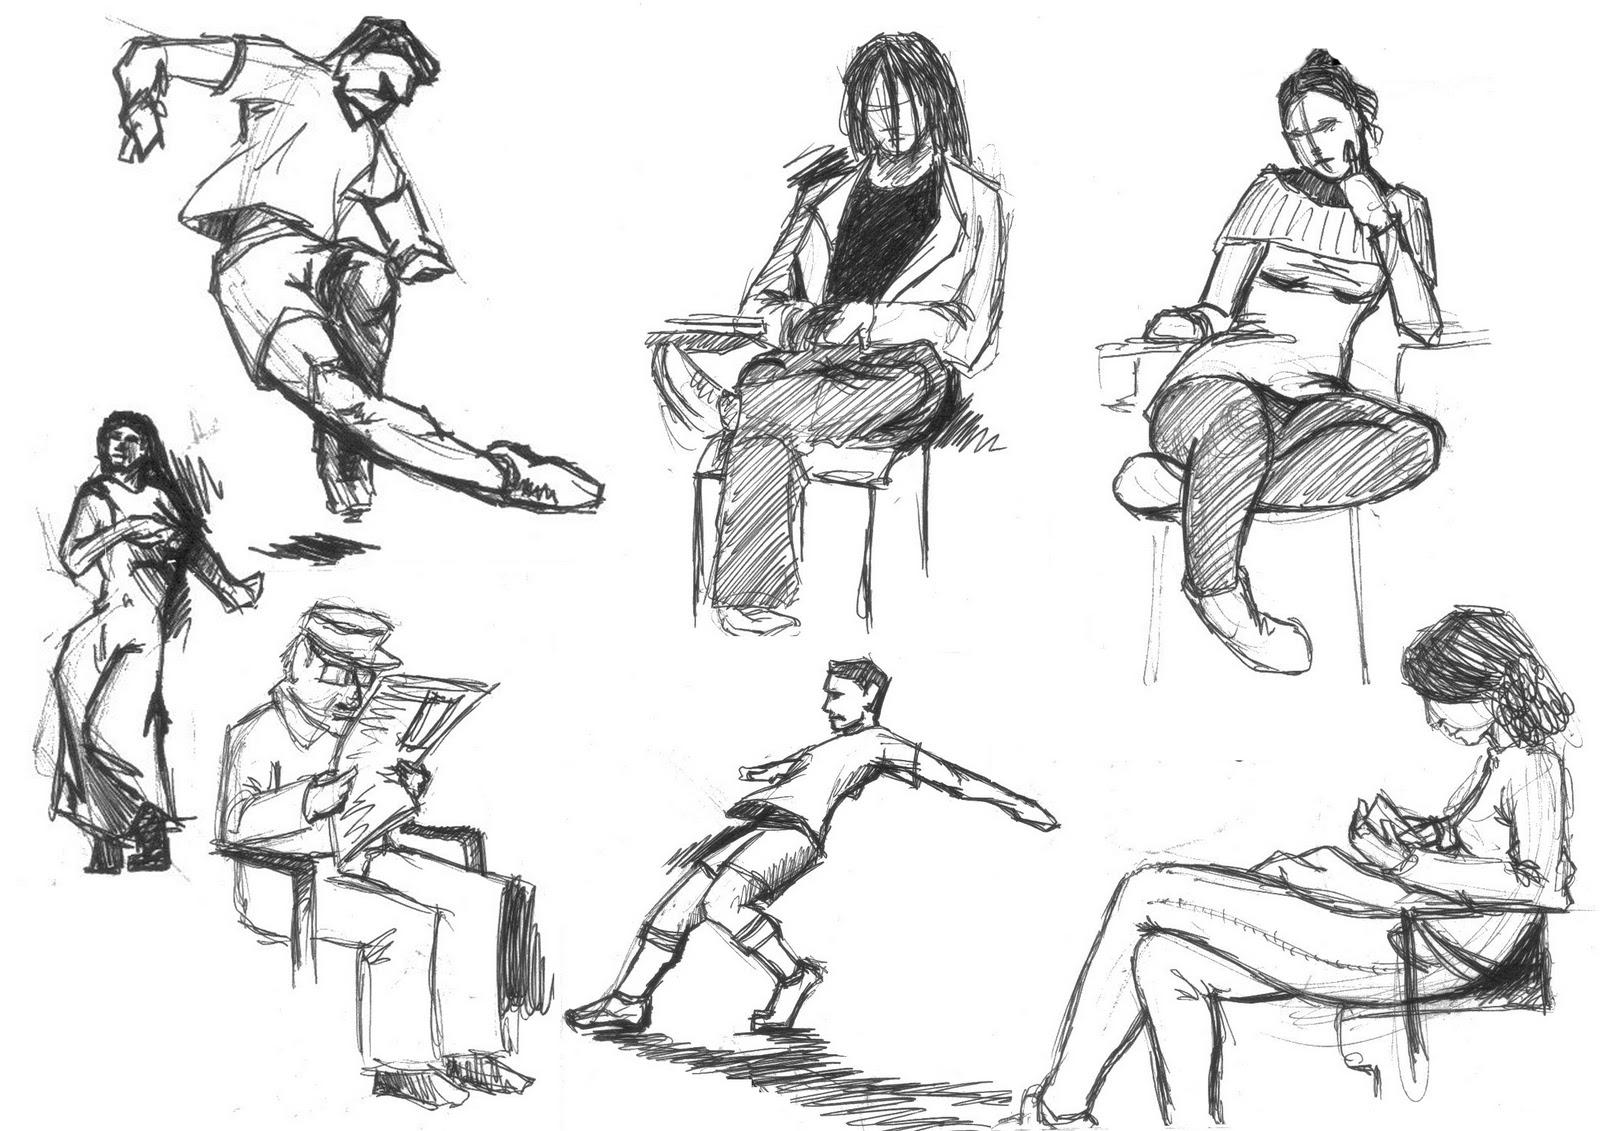 David Vzquez Guerrero 9zeros Dibujo ilustrativo Sketch 4